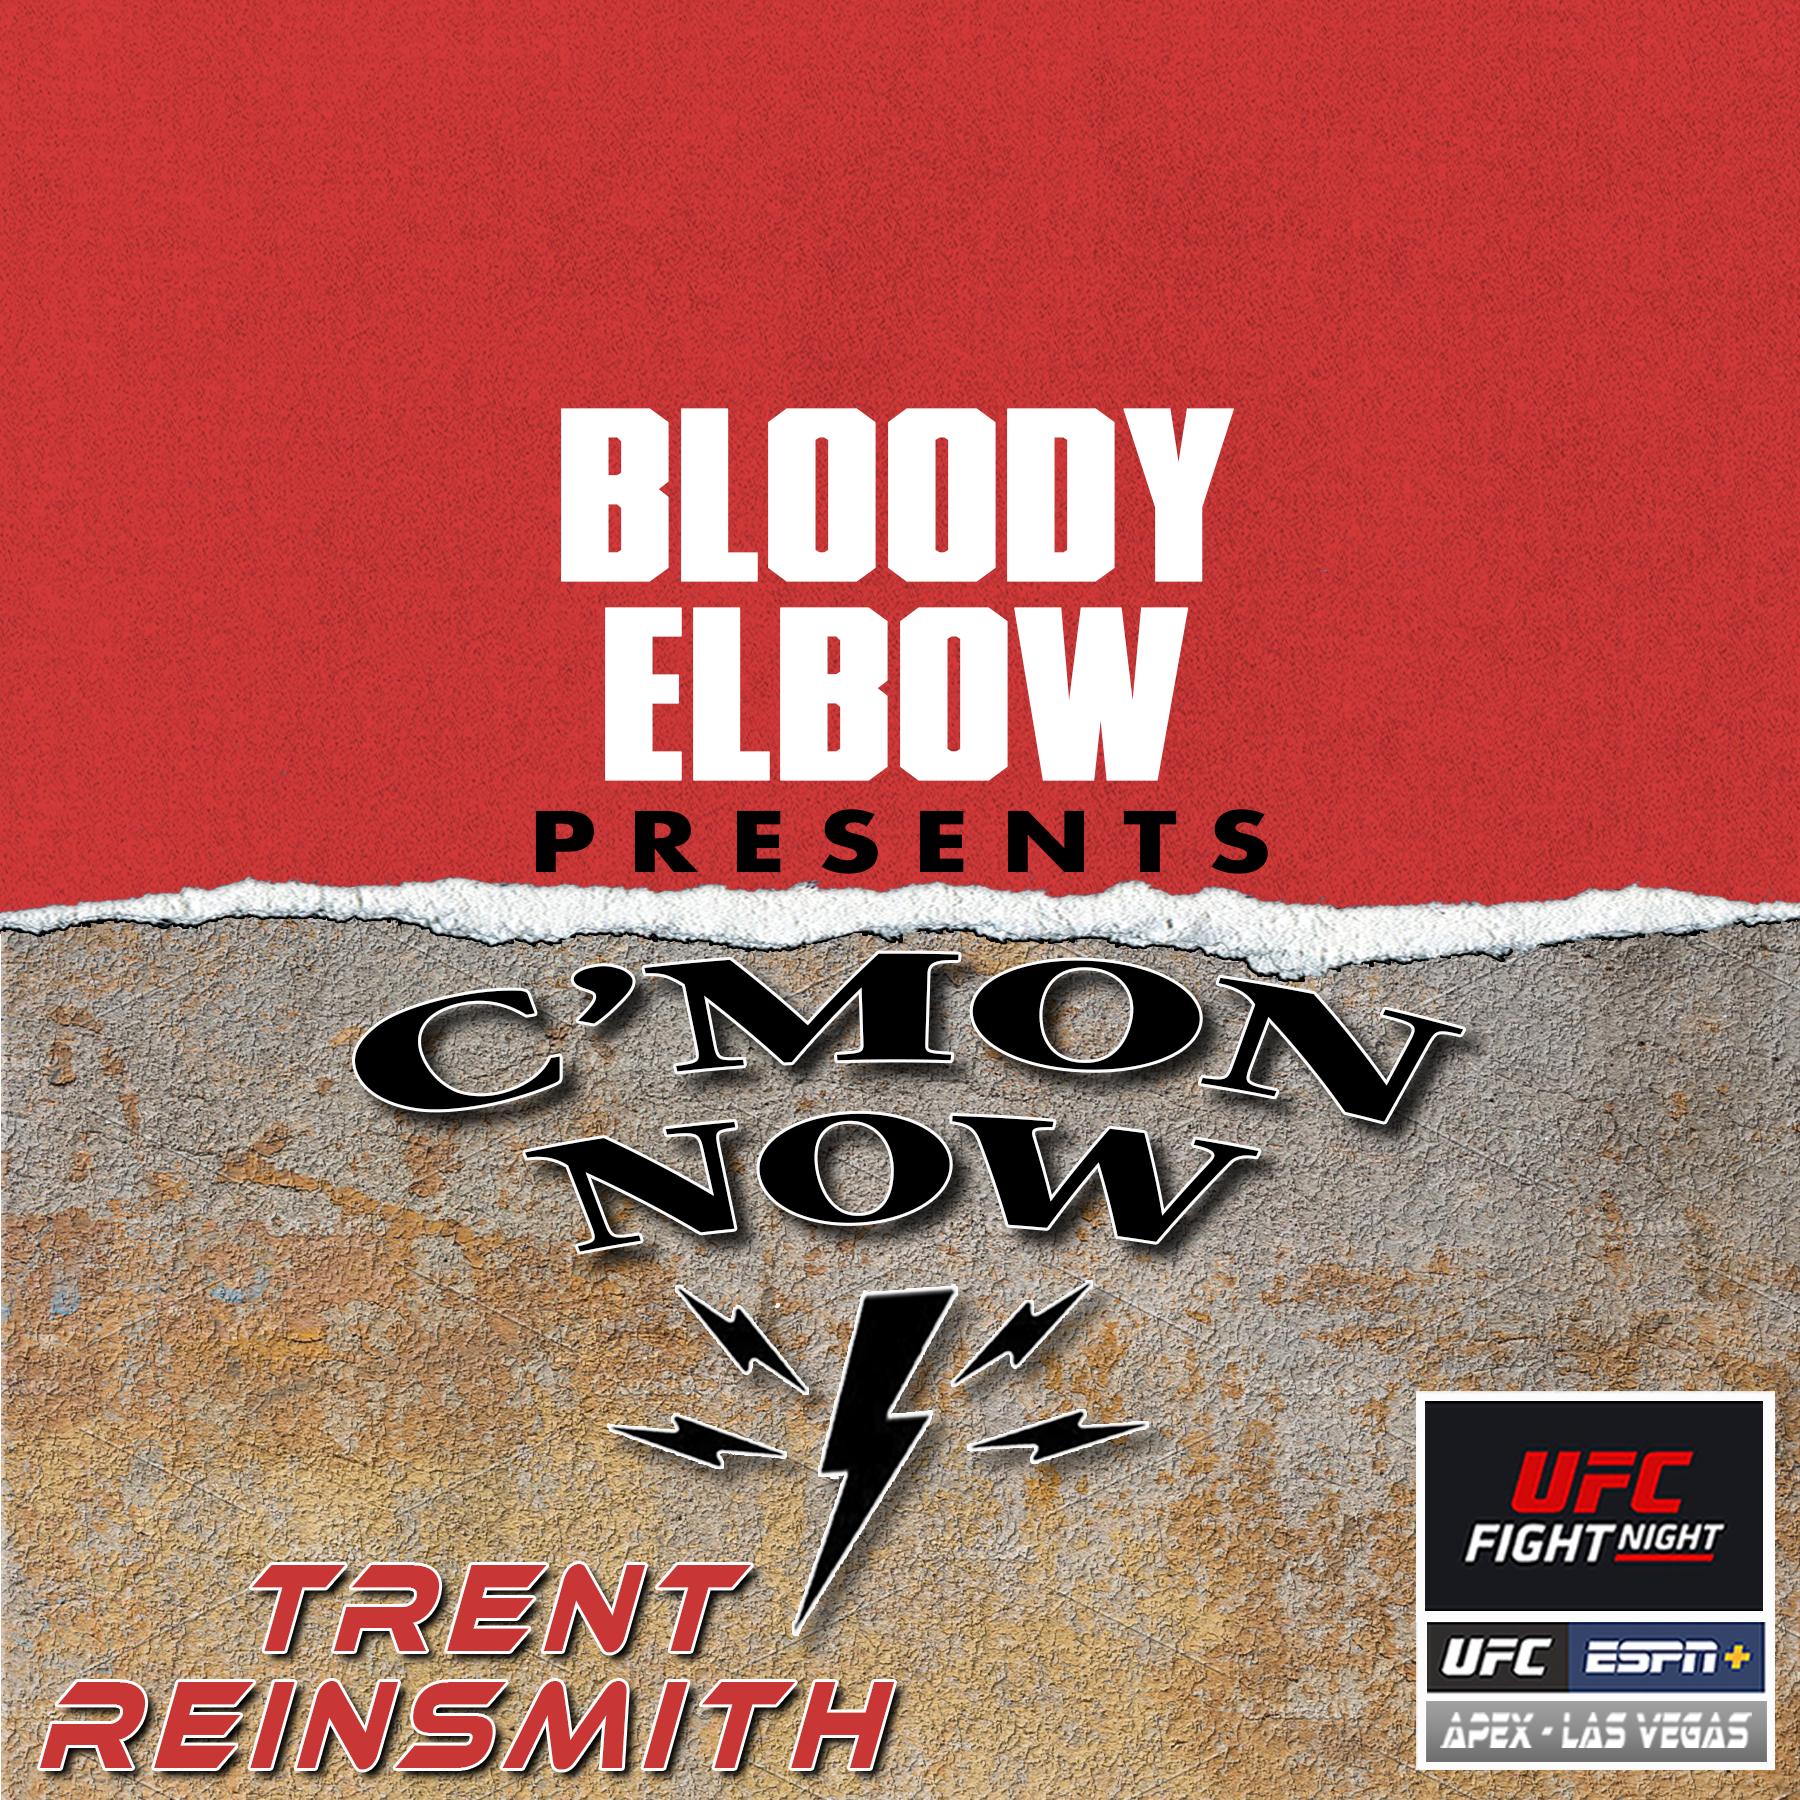 UFC Podcast, UFC Vegas, C'Mon Now MMA Podcast, Trent Reinsmith, UFC News, UFC Editorial, MMA Podcast